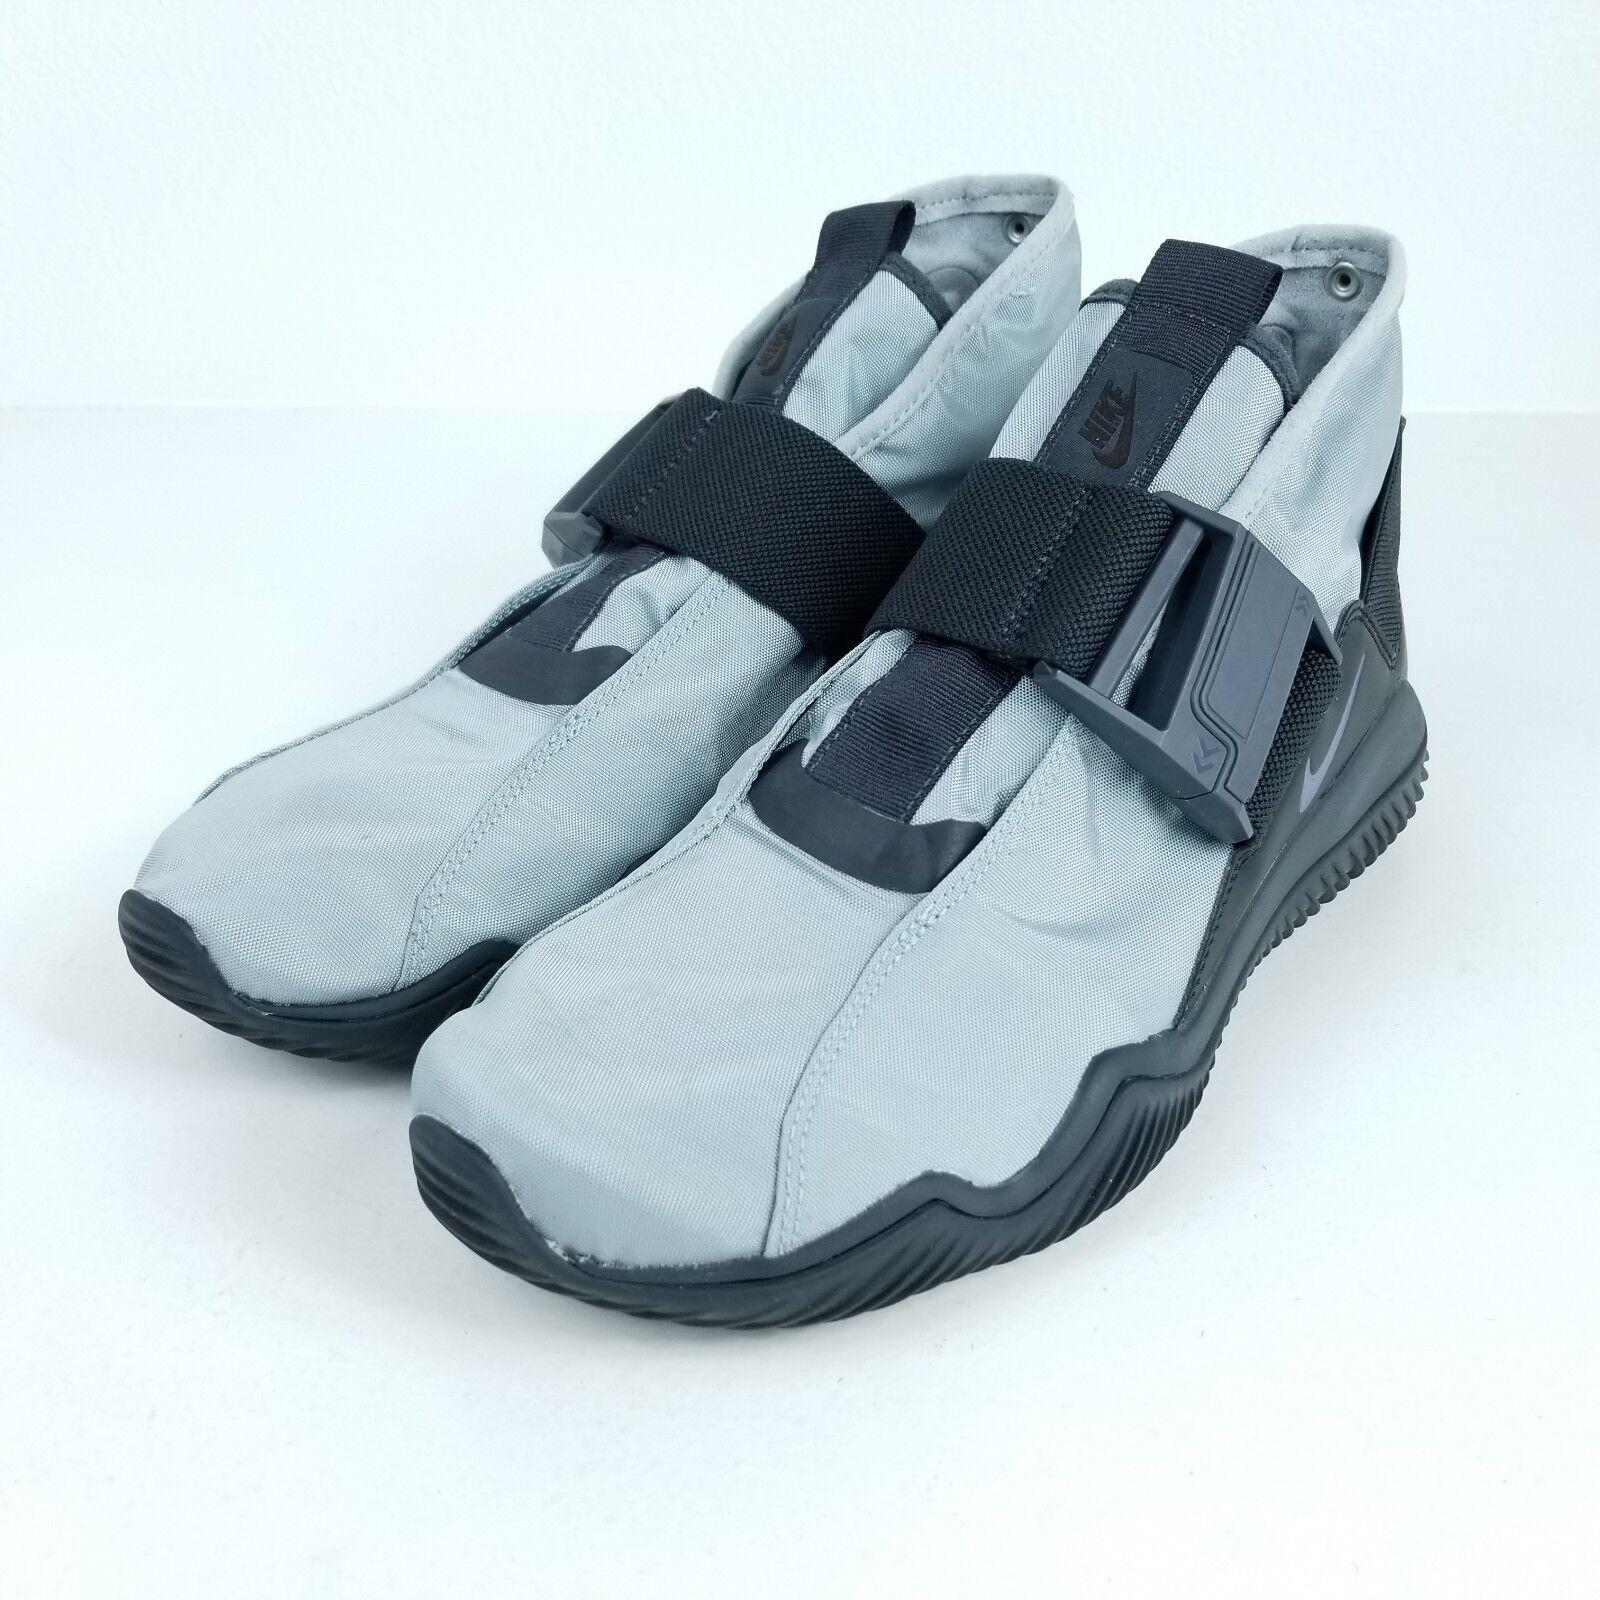 NIKE KomYuter Mens Size 8.5 9 Shoes Pumice Gray Thunder Blue AA2211 002